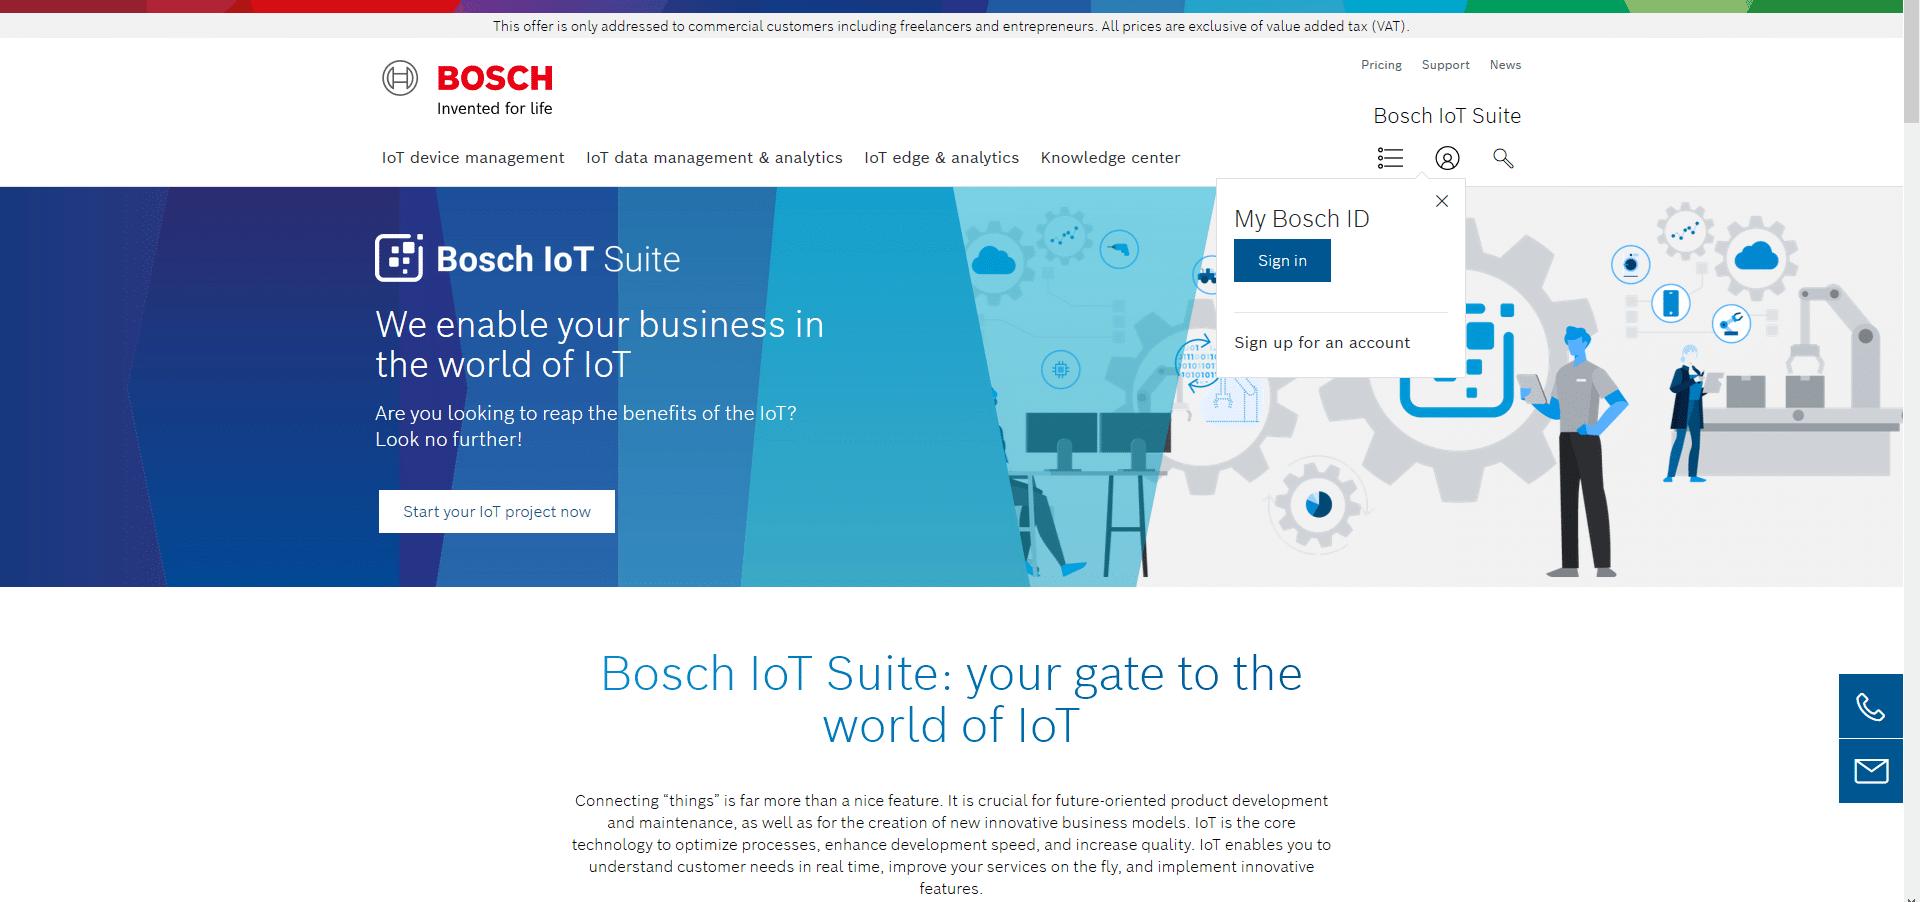 bosch-iot-suite-homepage